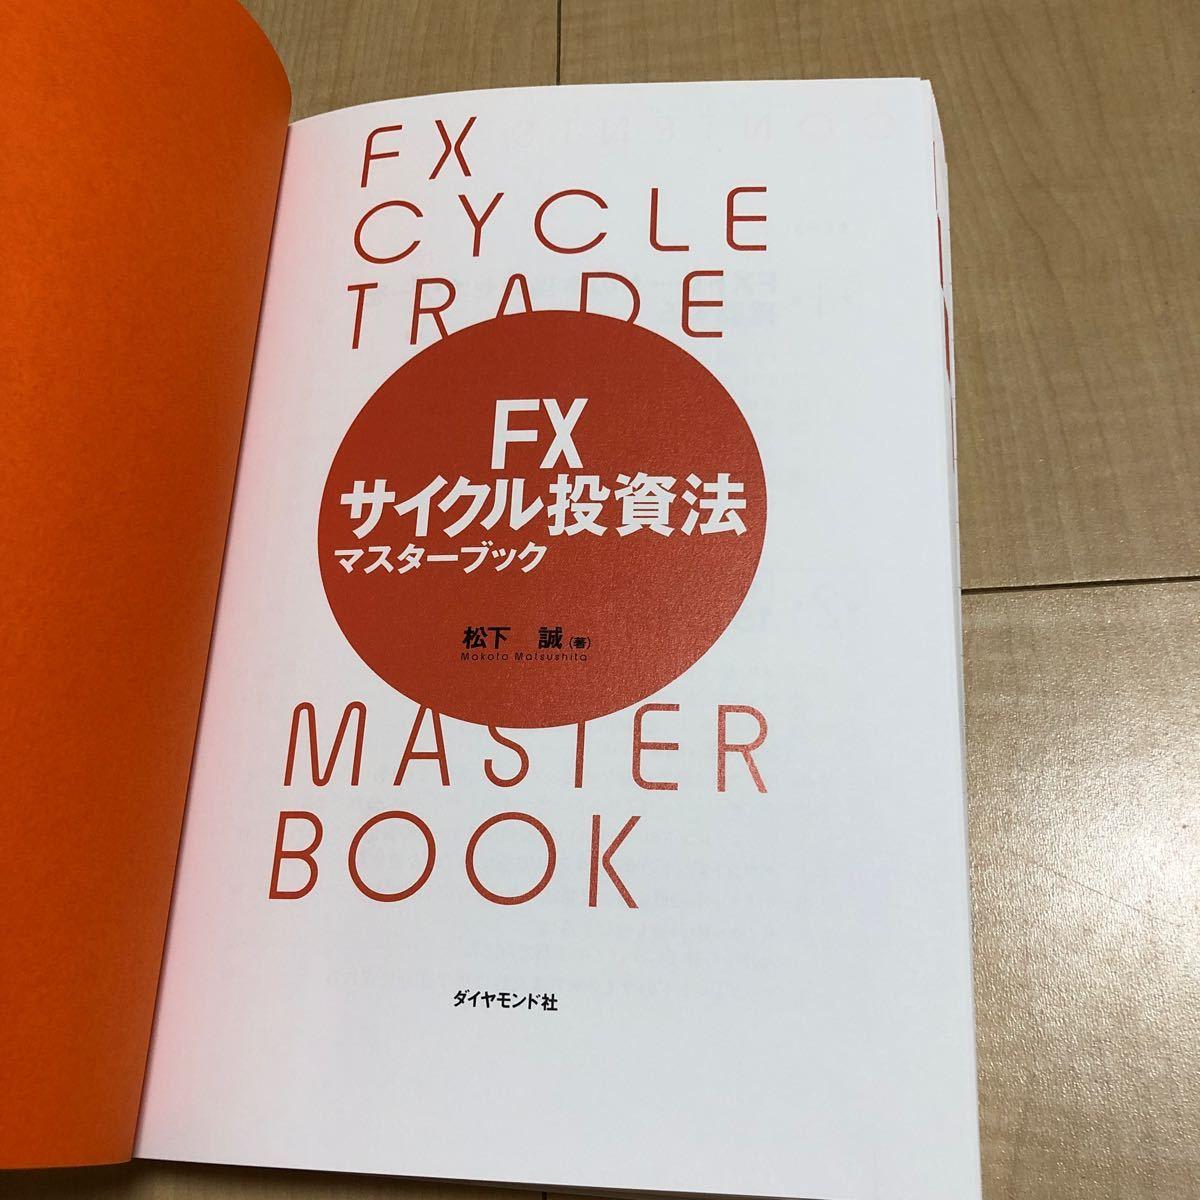 FXサイクル投資法マスターブック 為替相場の周期性を有効活用するトレードノウハウを集大成/松下誠 【著】